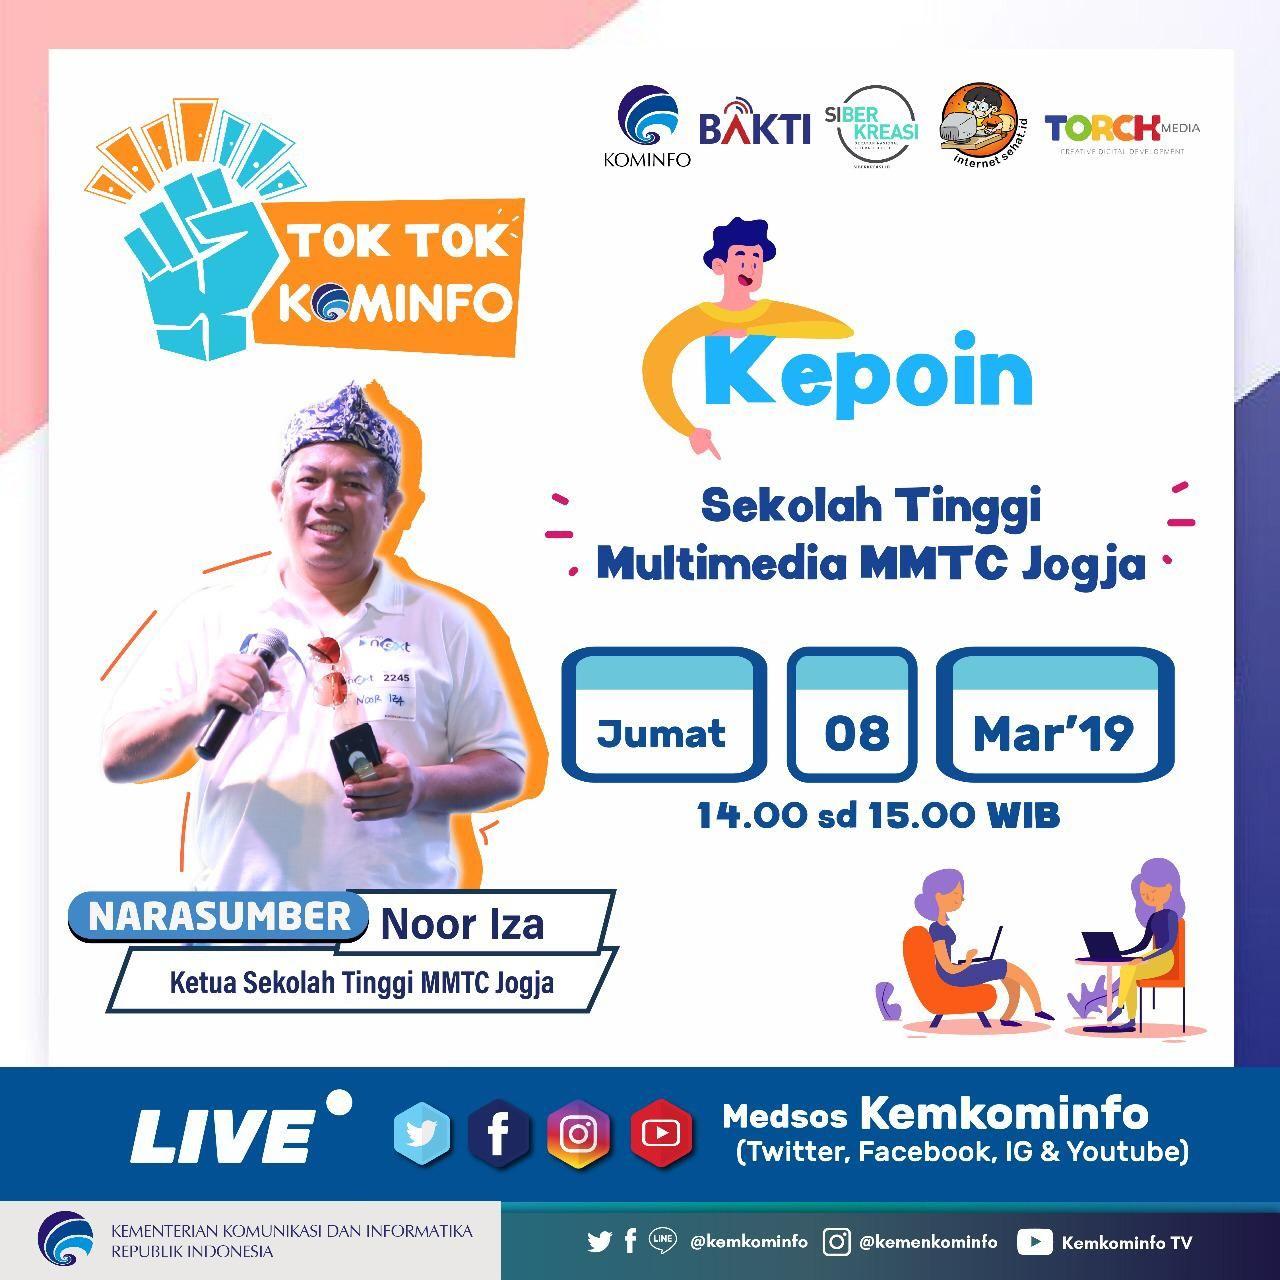 Live Tok Tok Kominfo - Kepoin Sekolah Tinggi Multimedia